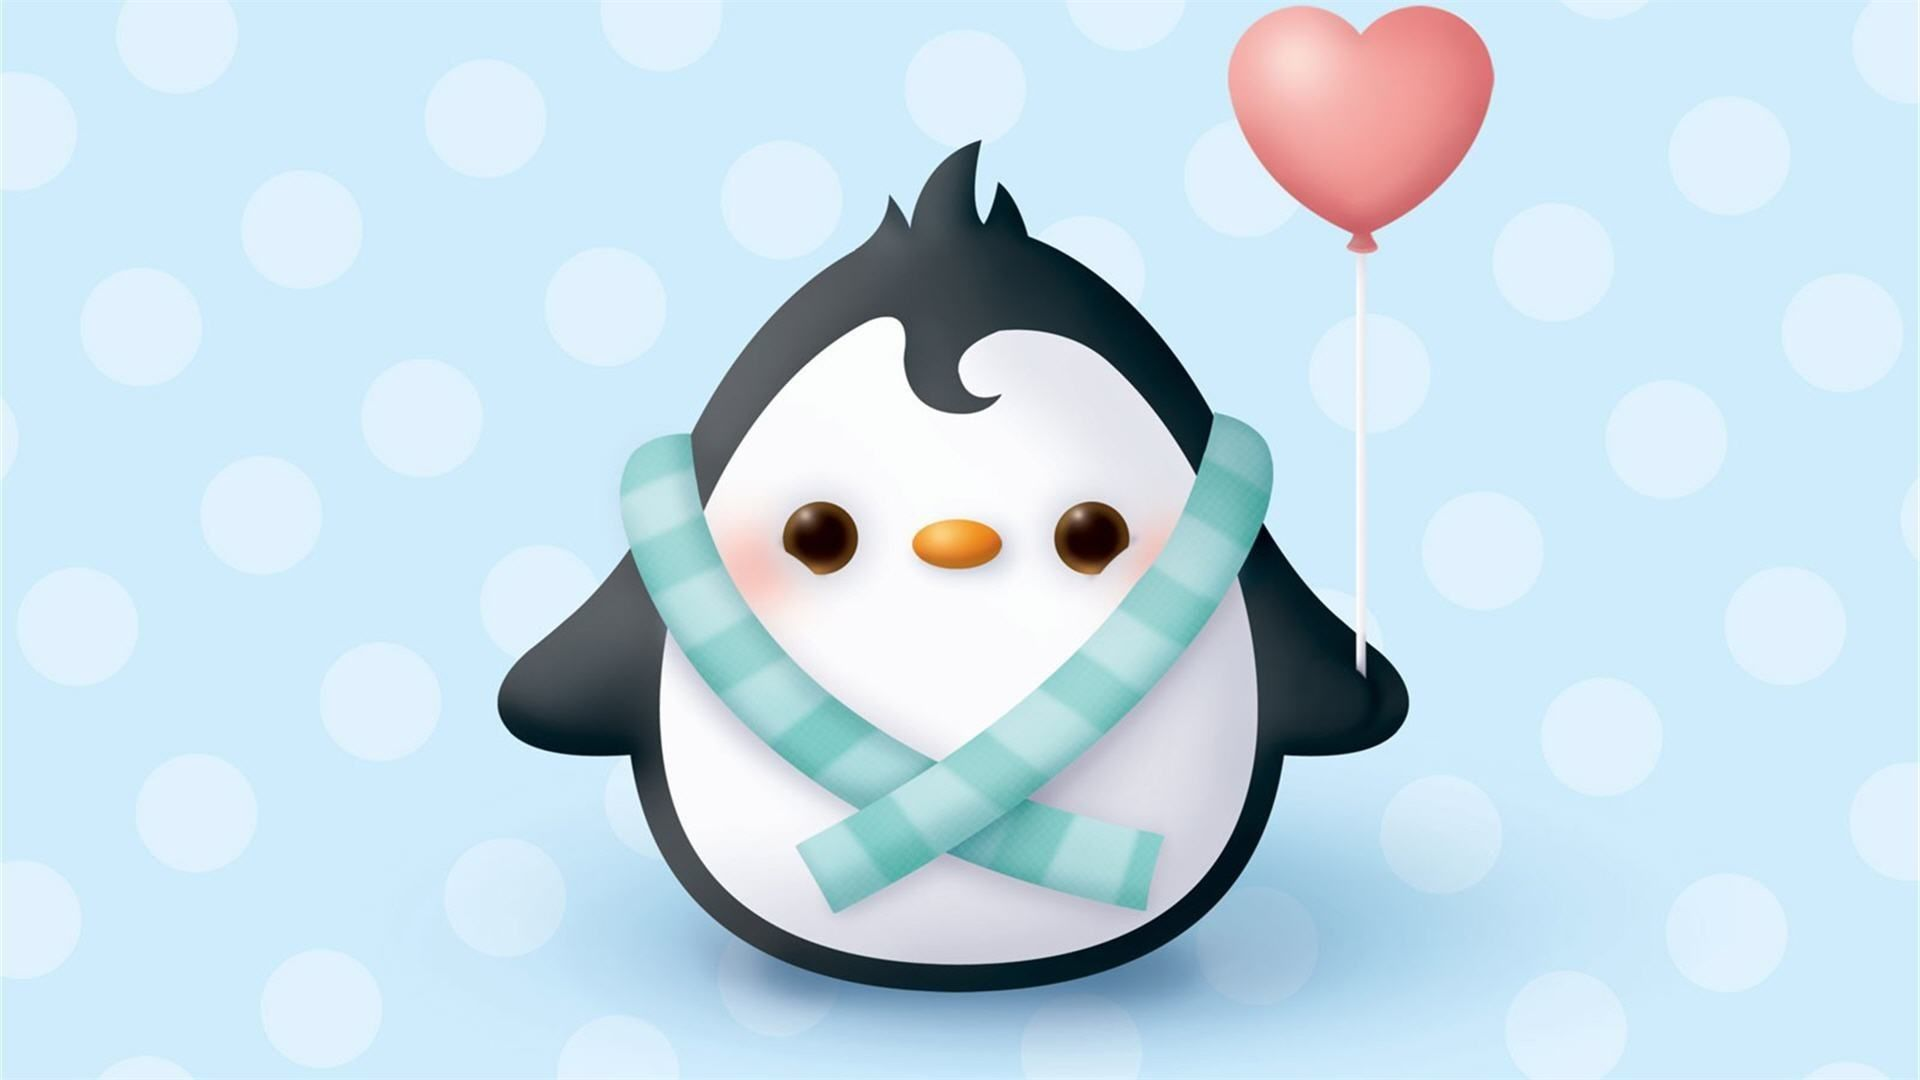 wallpaper pingwin